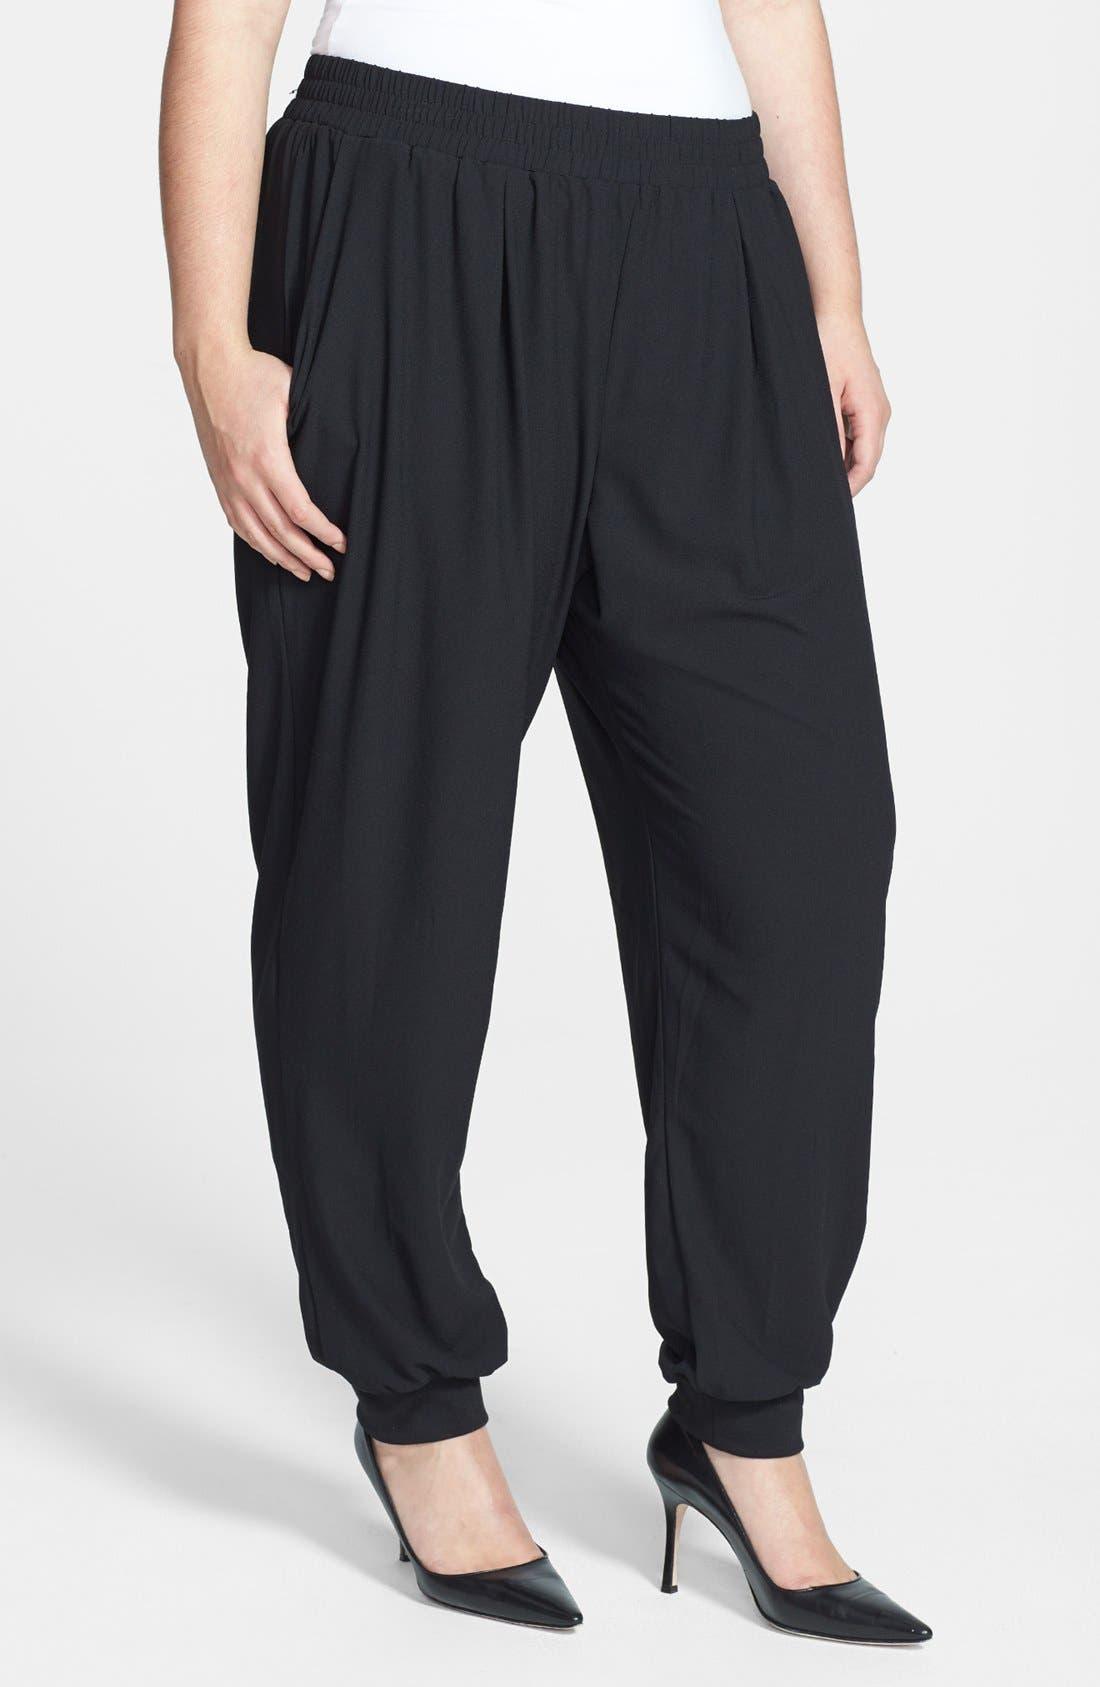 Alternate Image 1 Selected - Bobeau Track Pants (Plus Size)